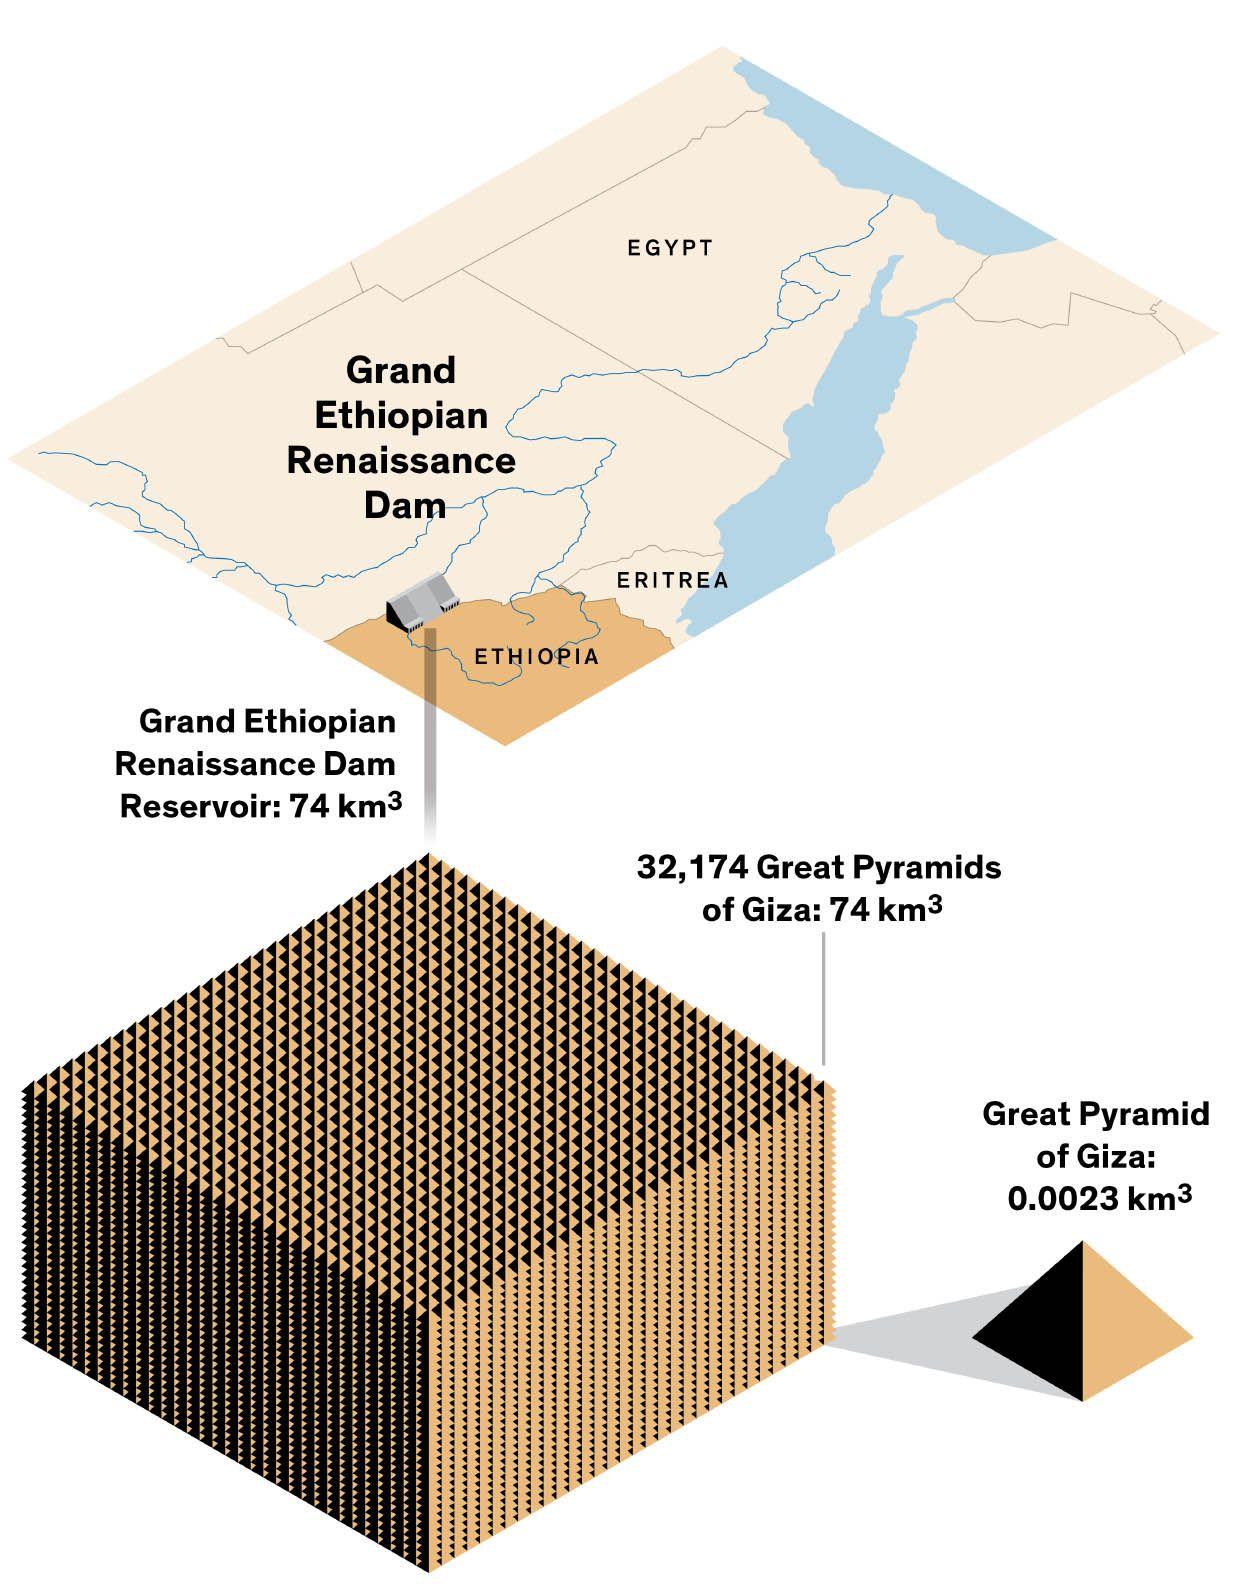 Illustration of the Grand Ethiopian Renaissance Dam.